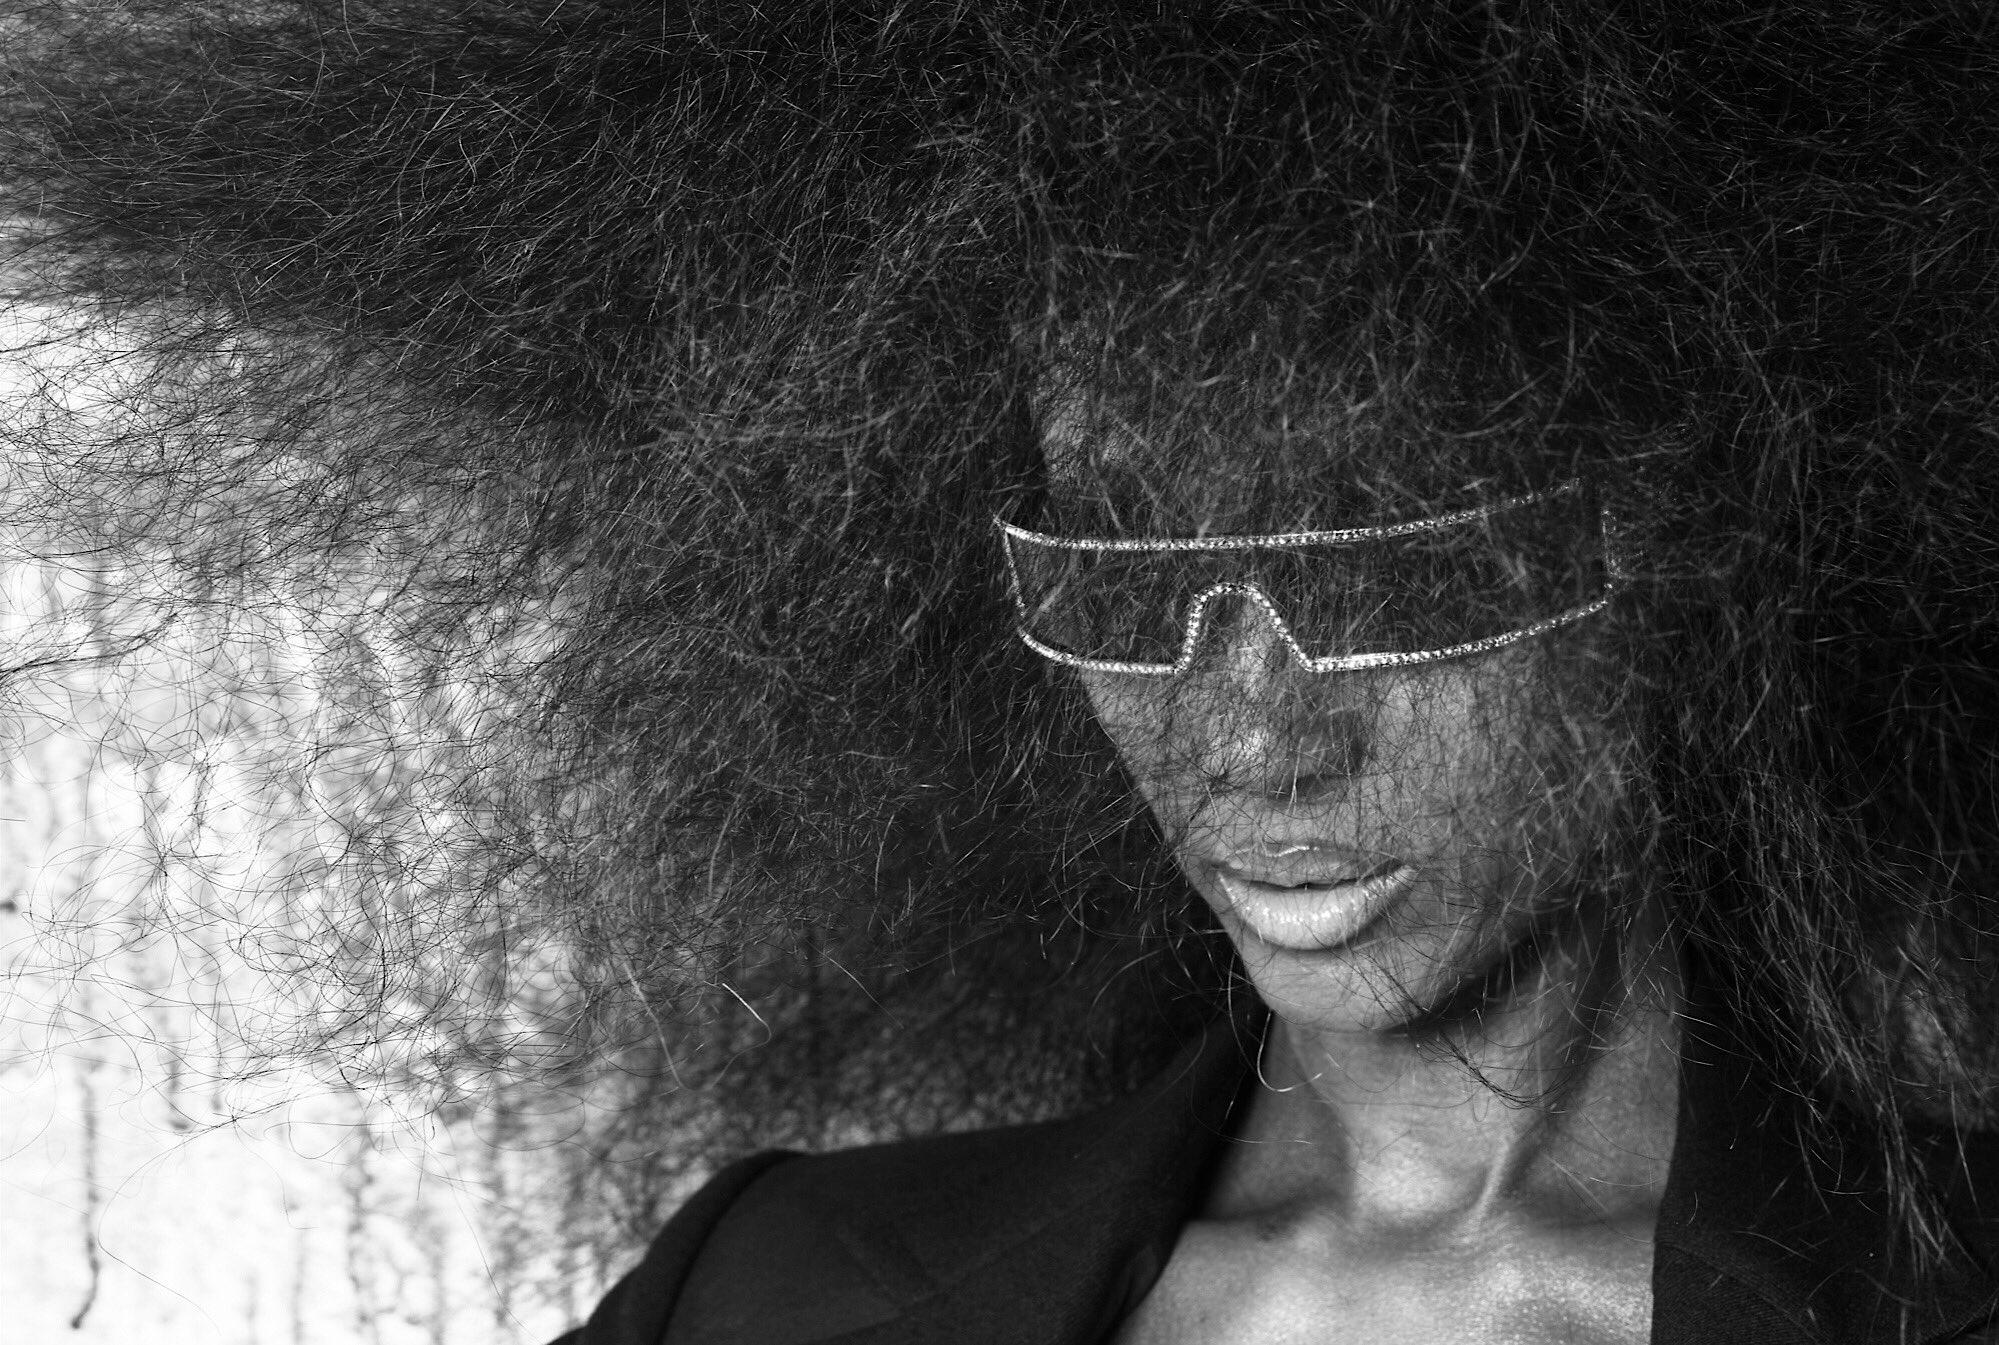 #tbt photo @warwicksaint hair @CHUCKIELOVE #imanarchive https://t.co/aO95cmf7k8